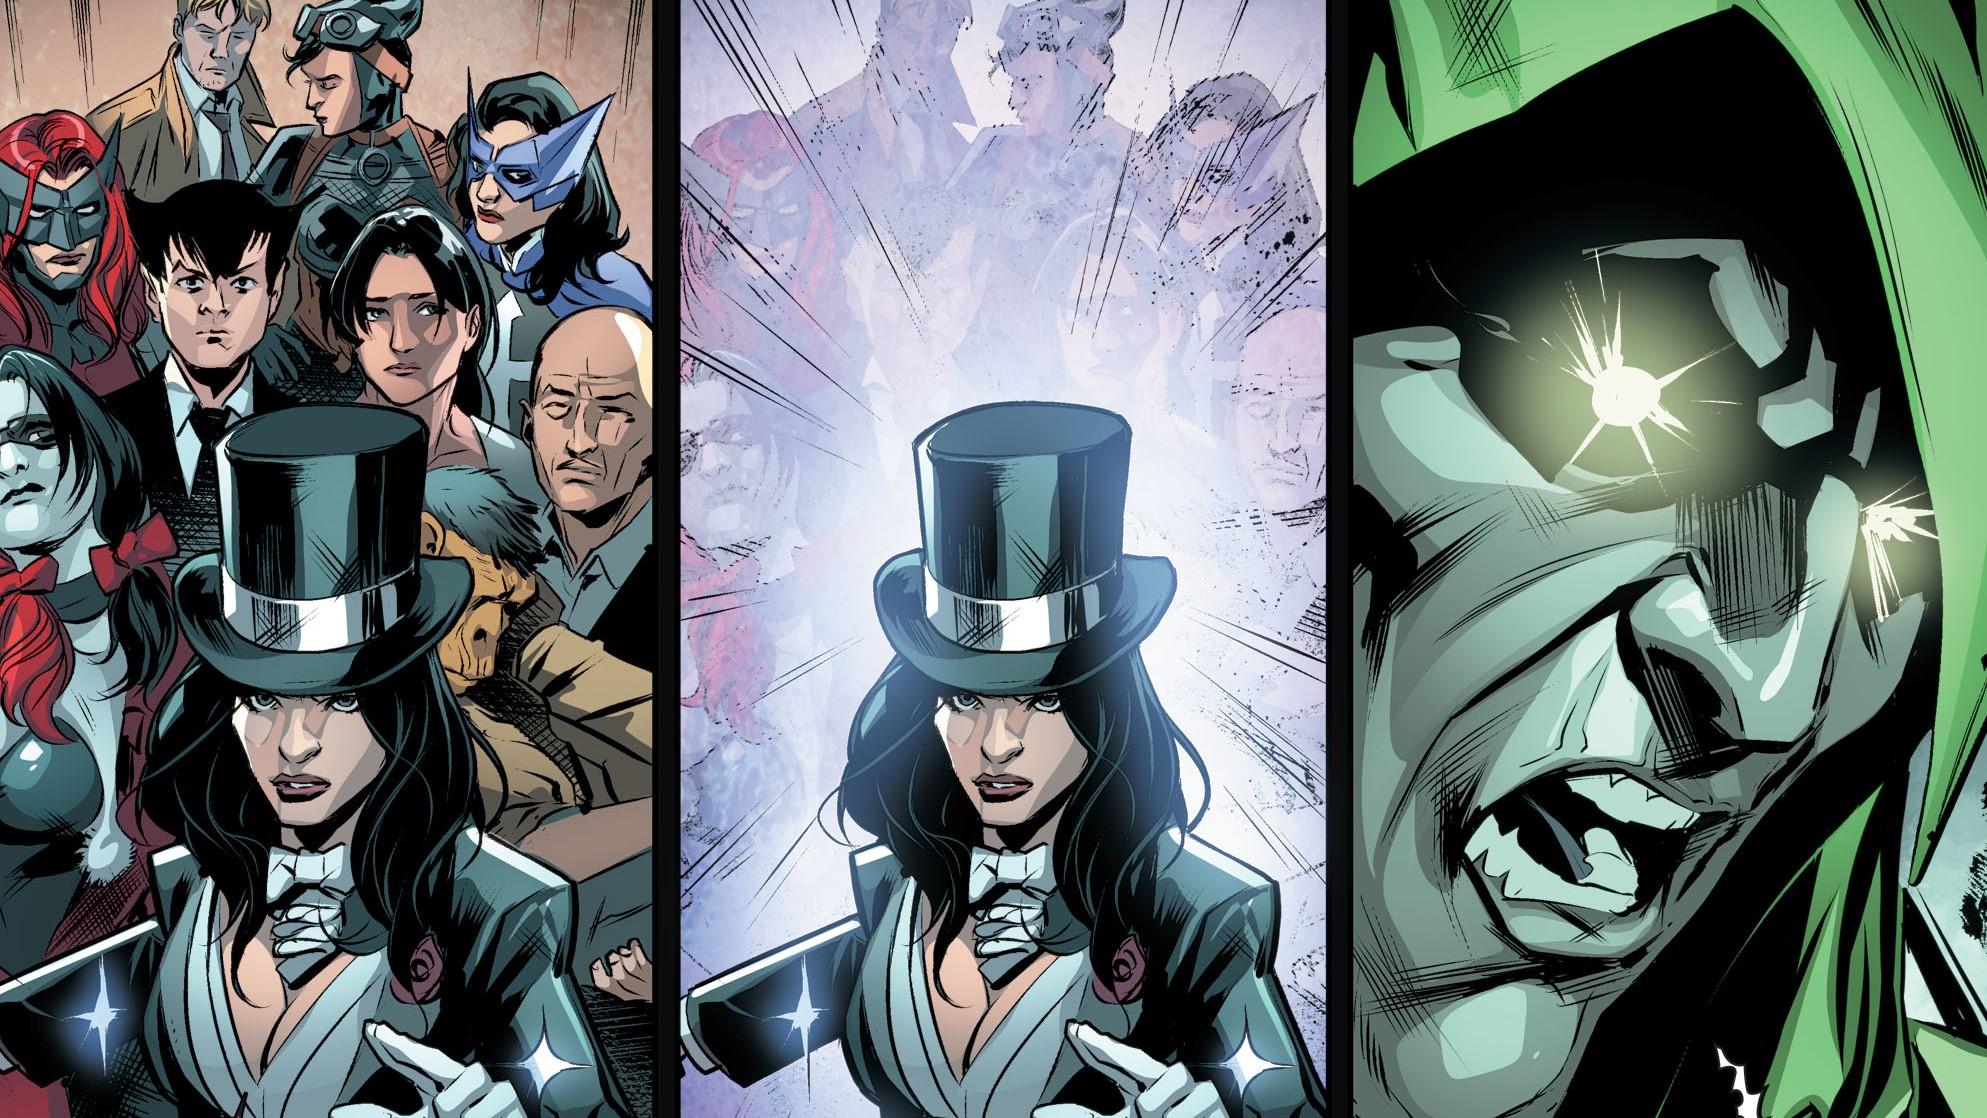 Anime 1987x1118 Injustice God's among us DC Comics DC Universe Zatanna Huntress Harley Quinn Batwoman Catwoman